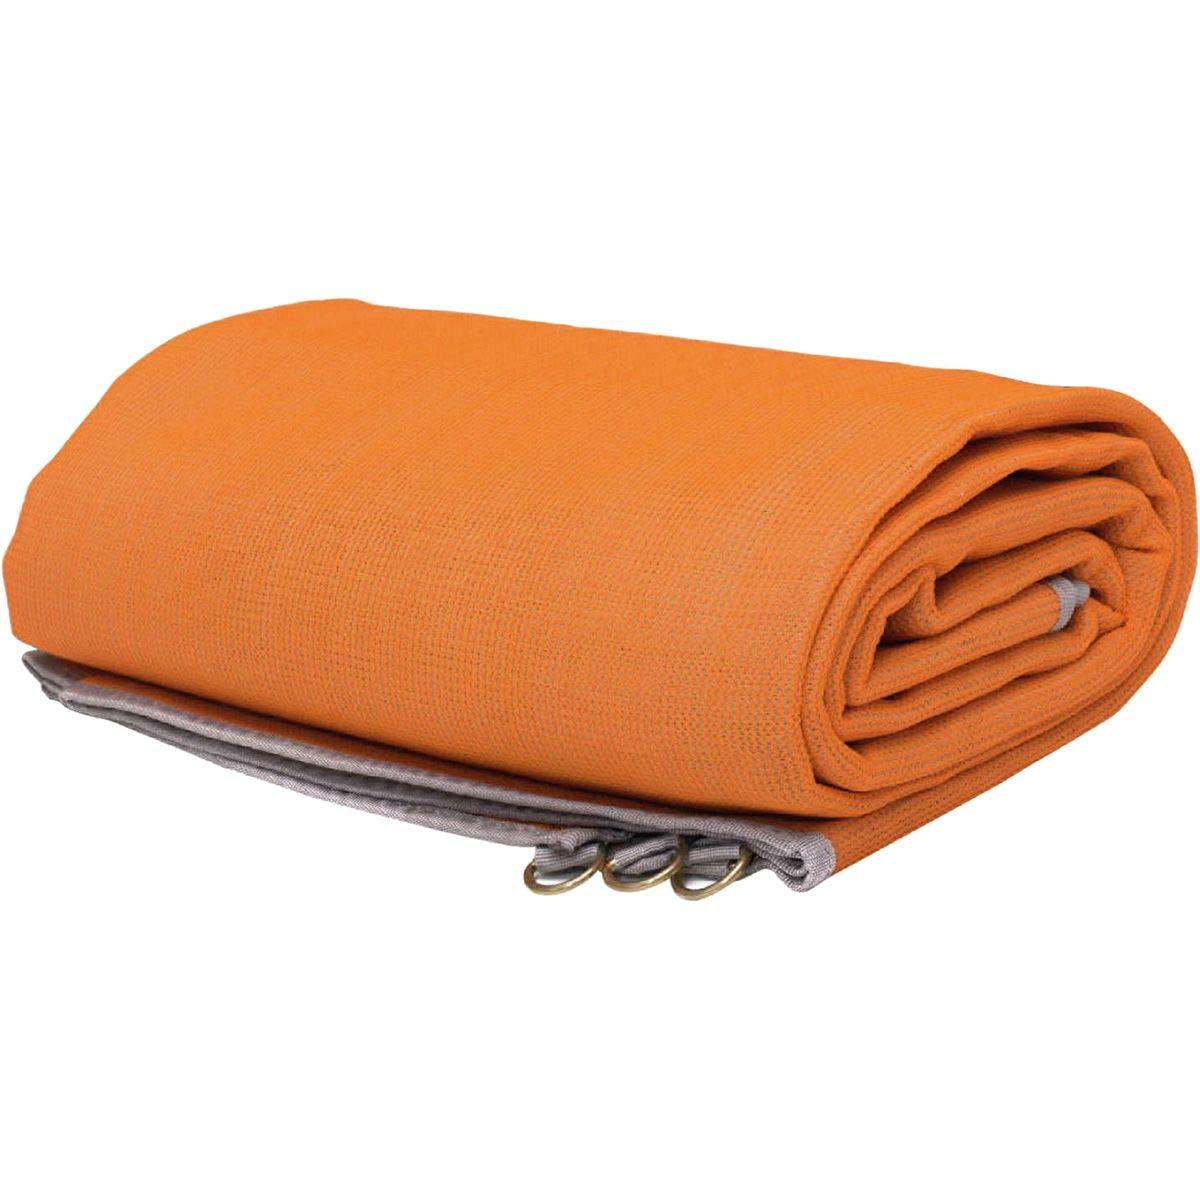 CGear The Mat - Patented Outdoor Camping Mat, Orange, 10' x 10'